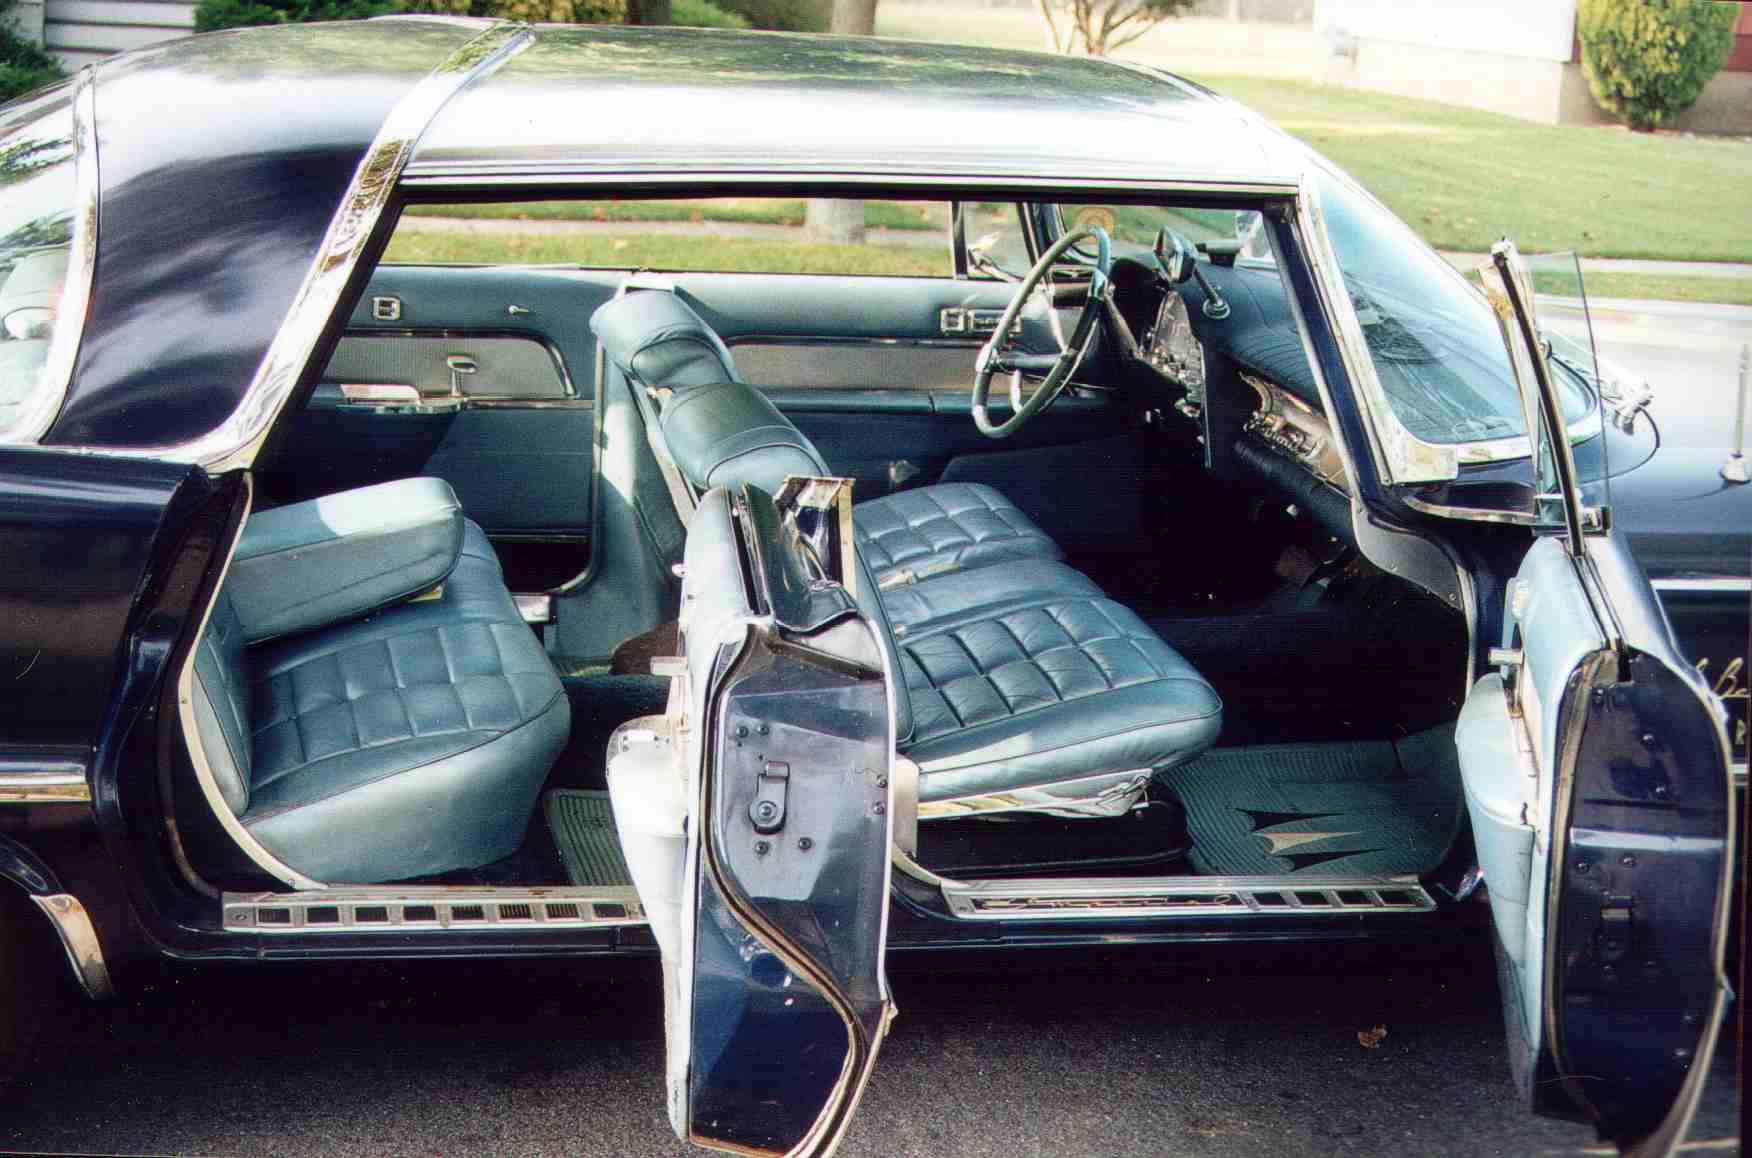 1956 chrysler imperial interior images - 1956 Chrysler Imperial Interior Images 19